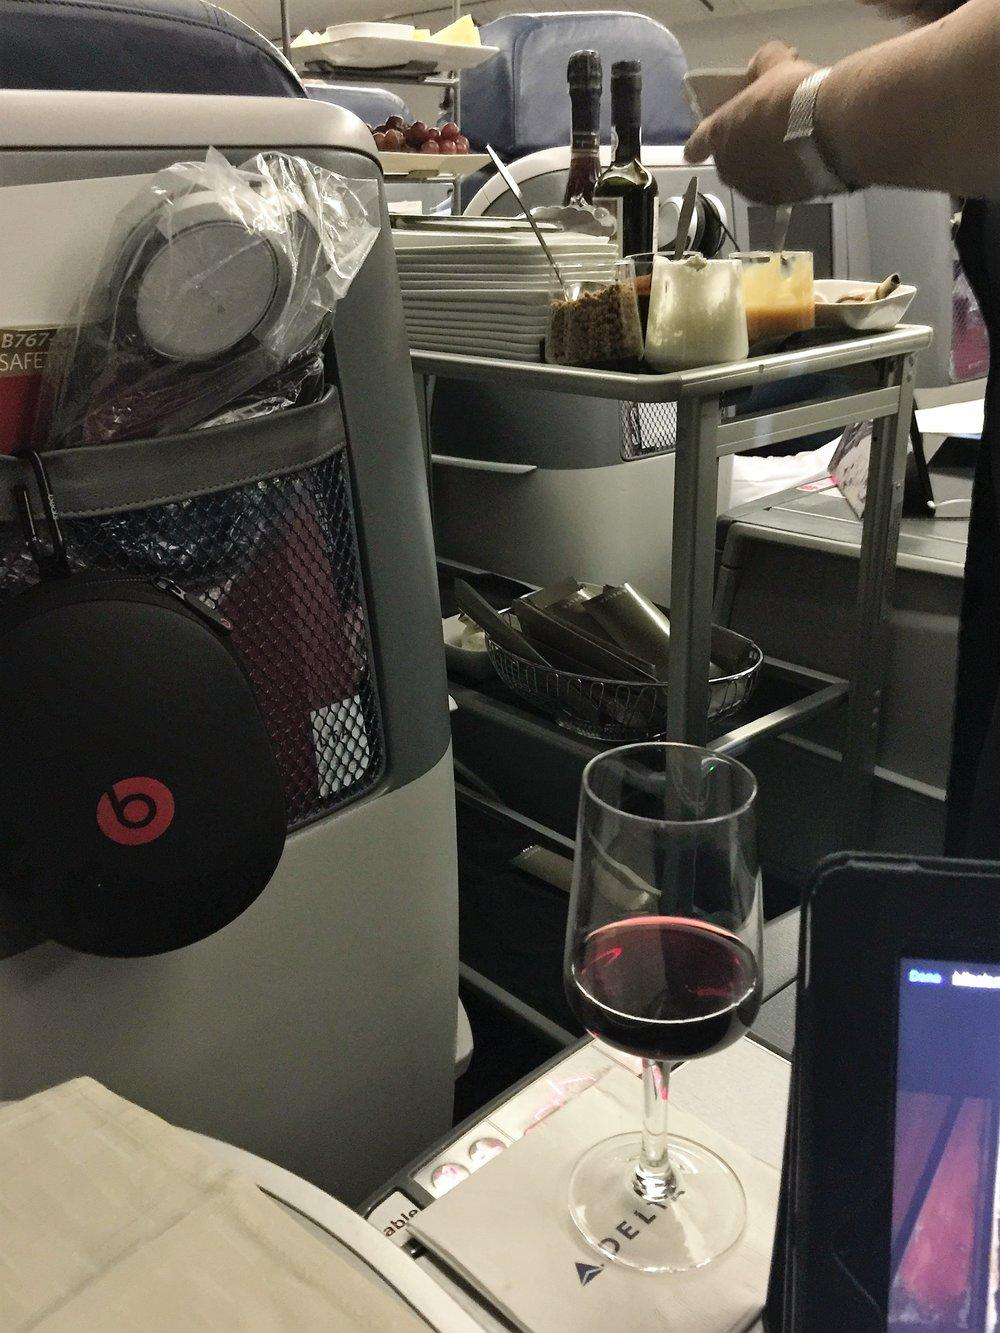 Dessert cart and a glass of Port